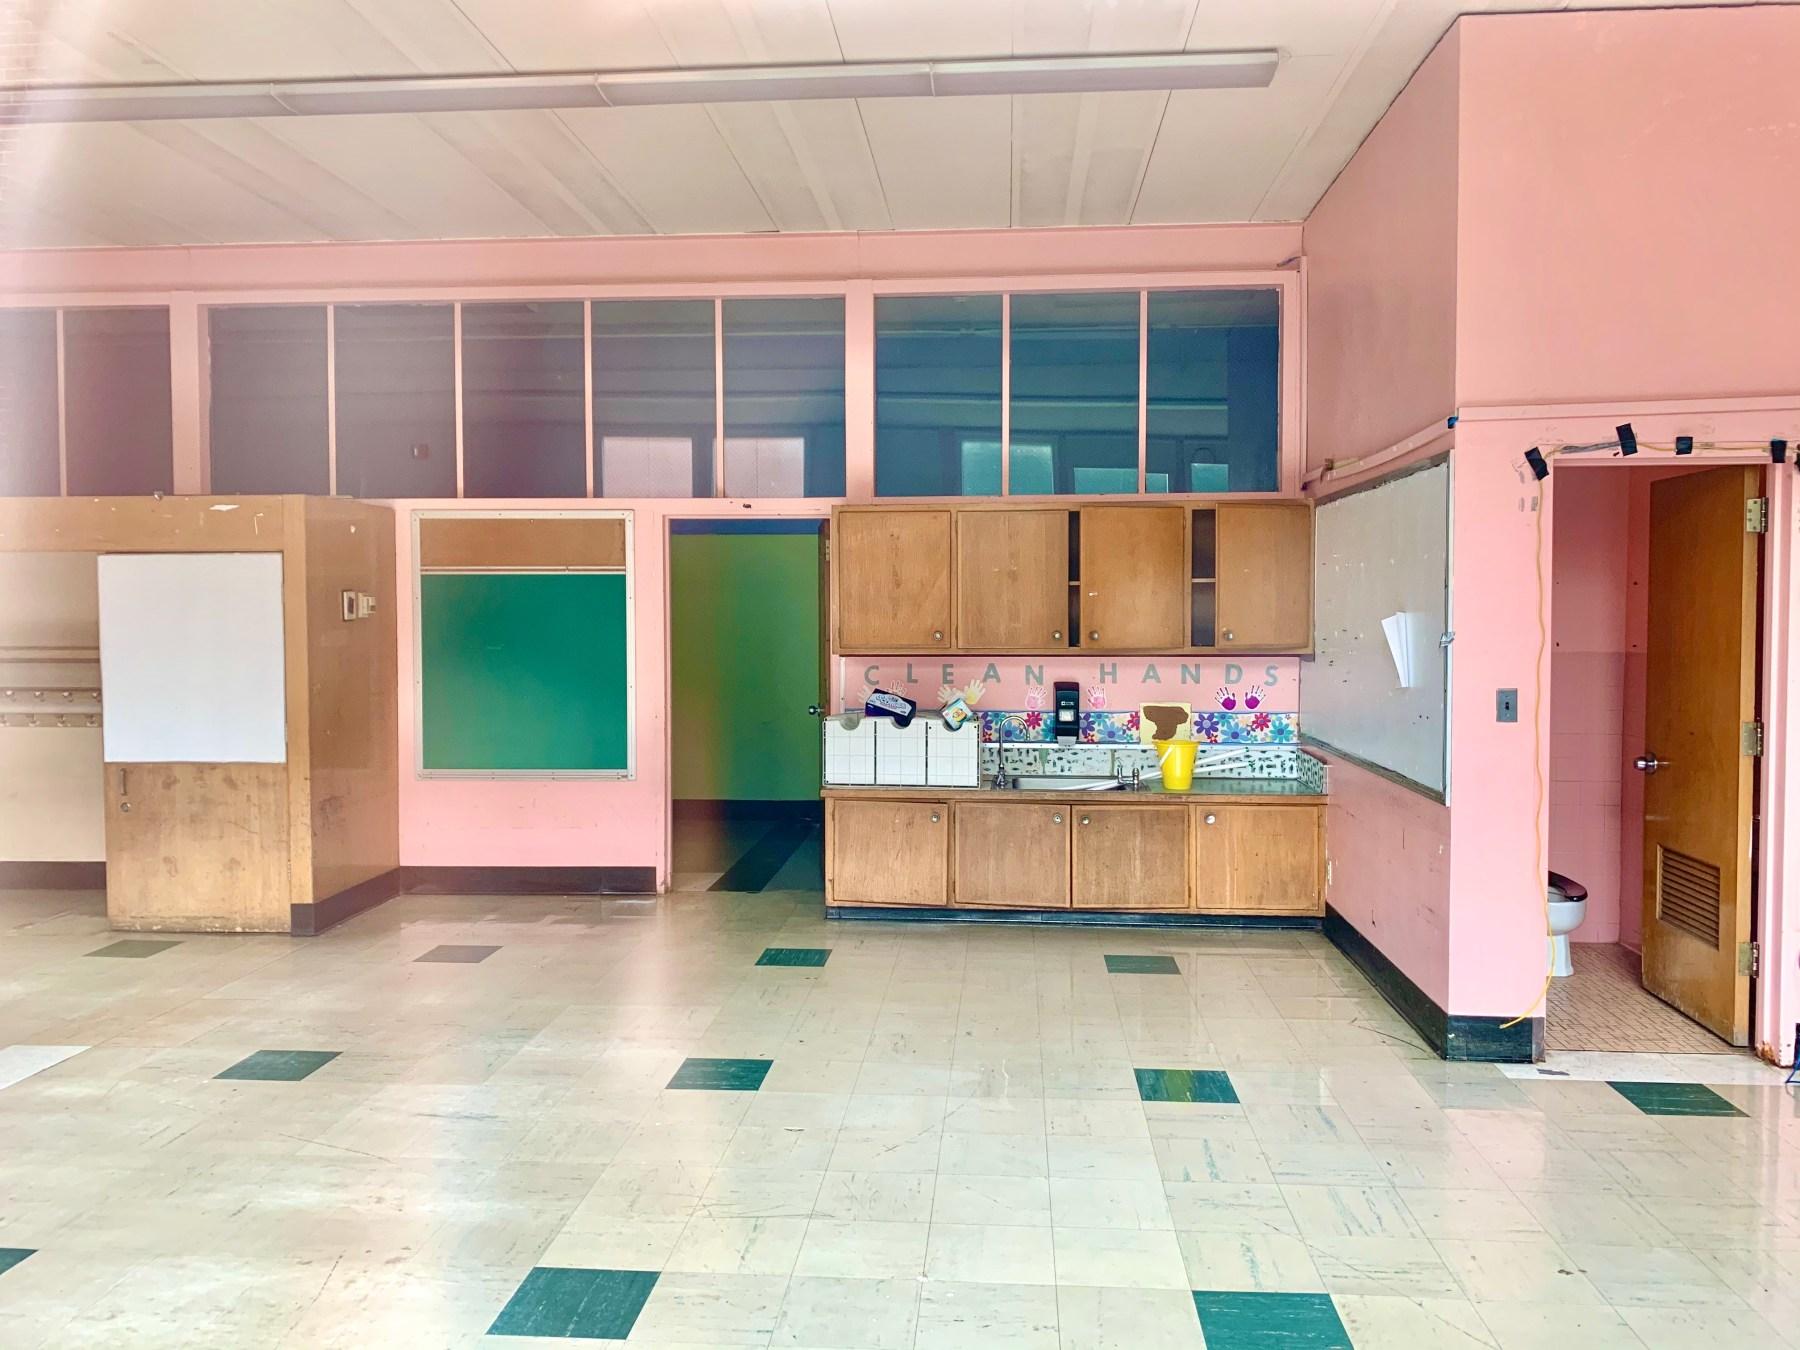 Daniel P. Hurld Elementary School 25 Woburn MA